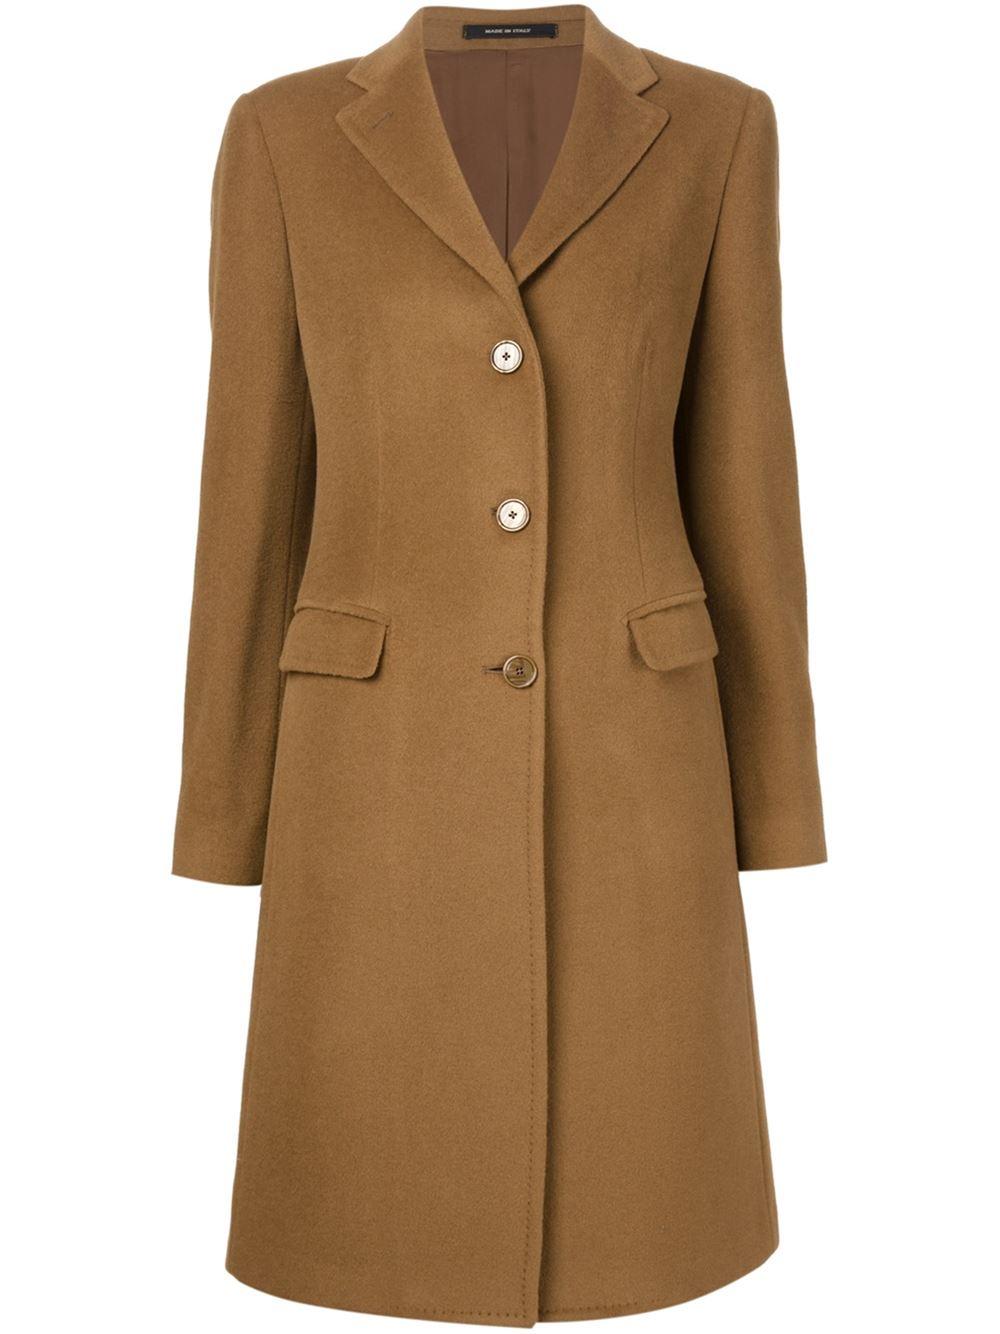 Camel coloured alpaca-wool blend classic overcoat from Tagliatore